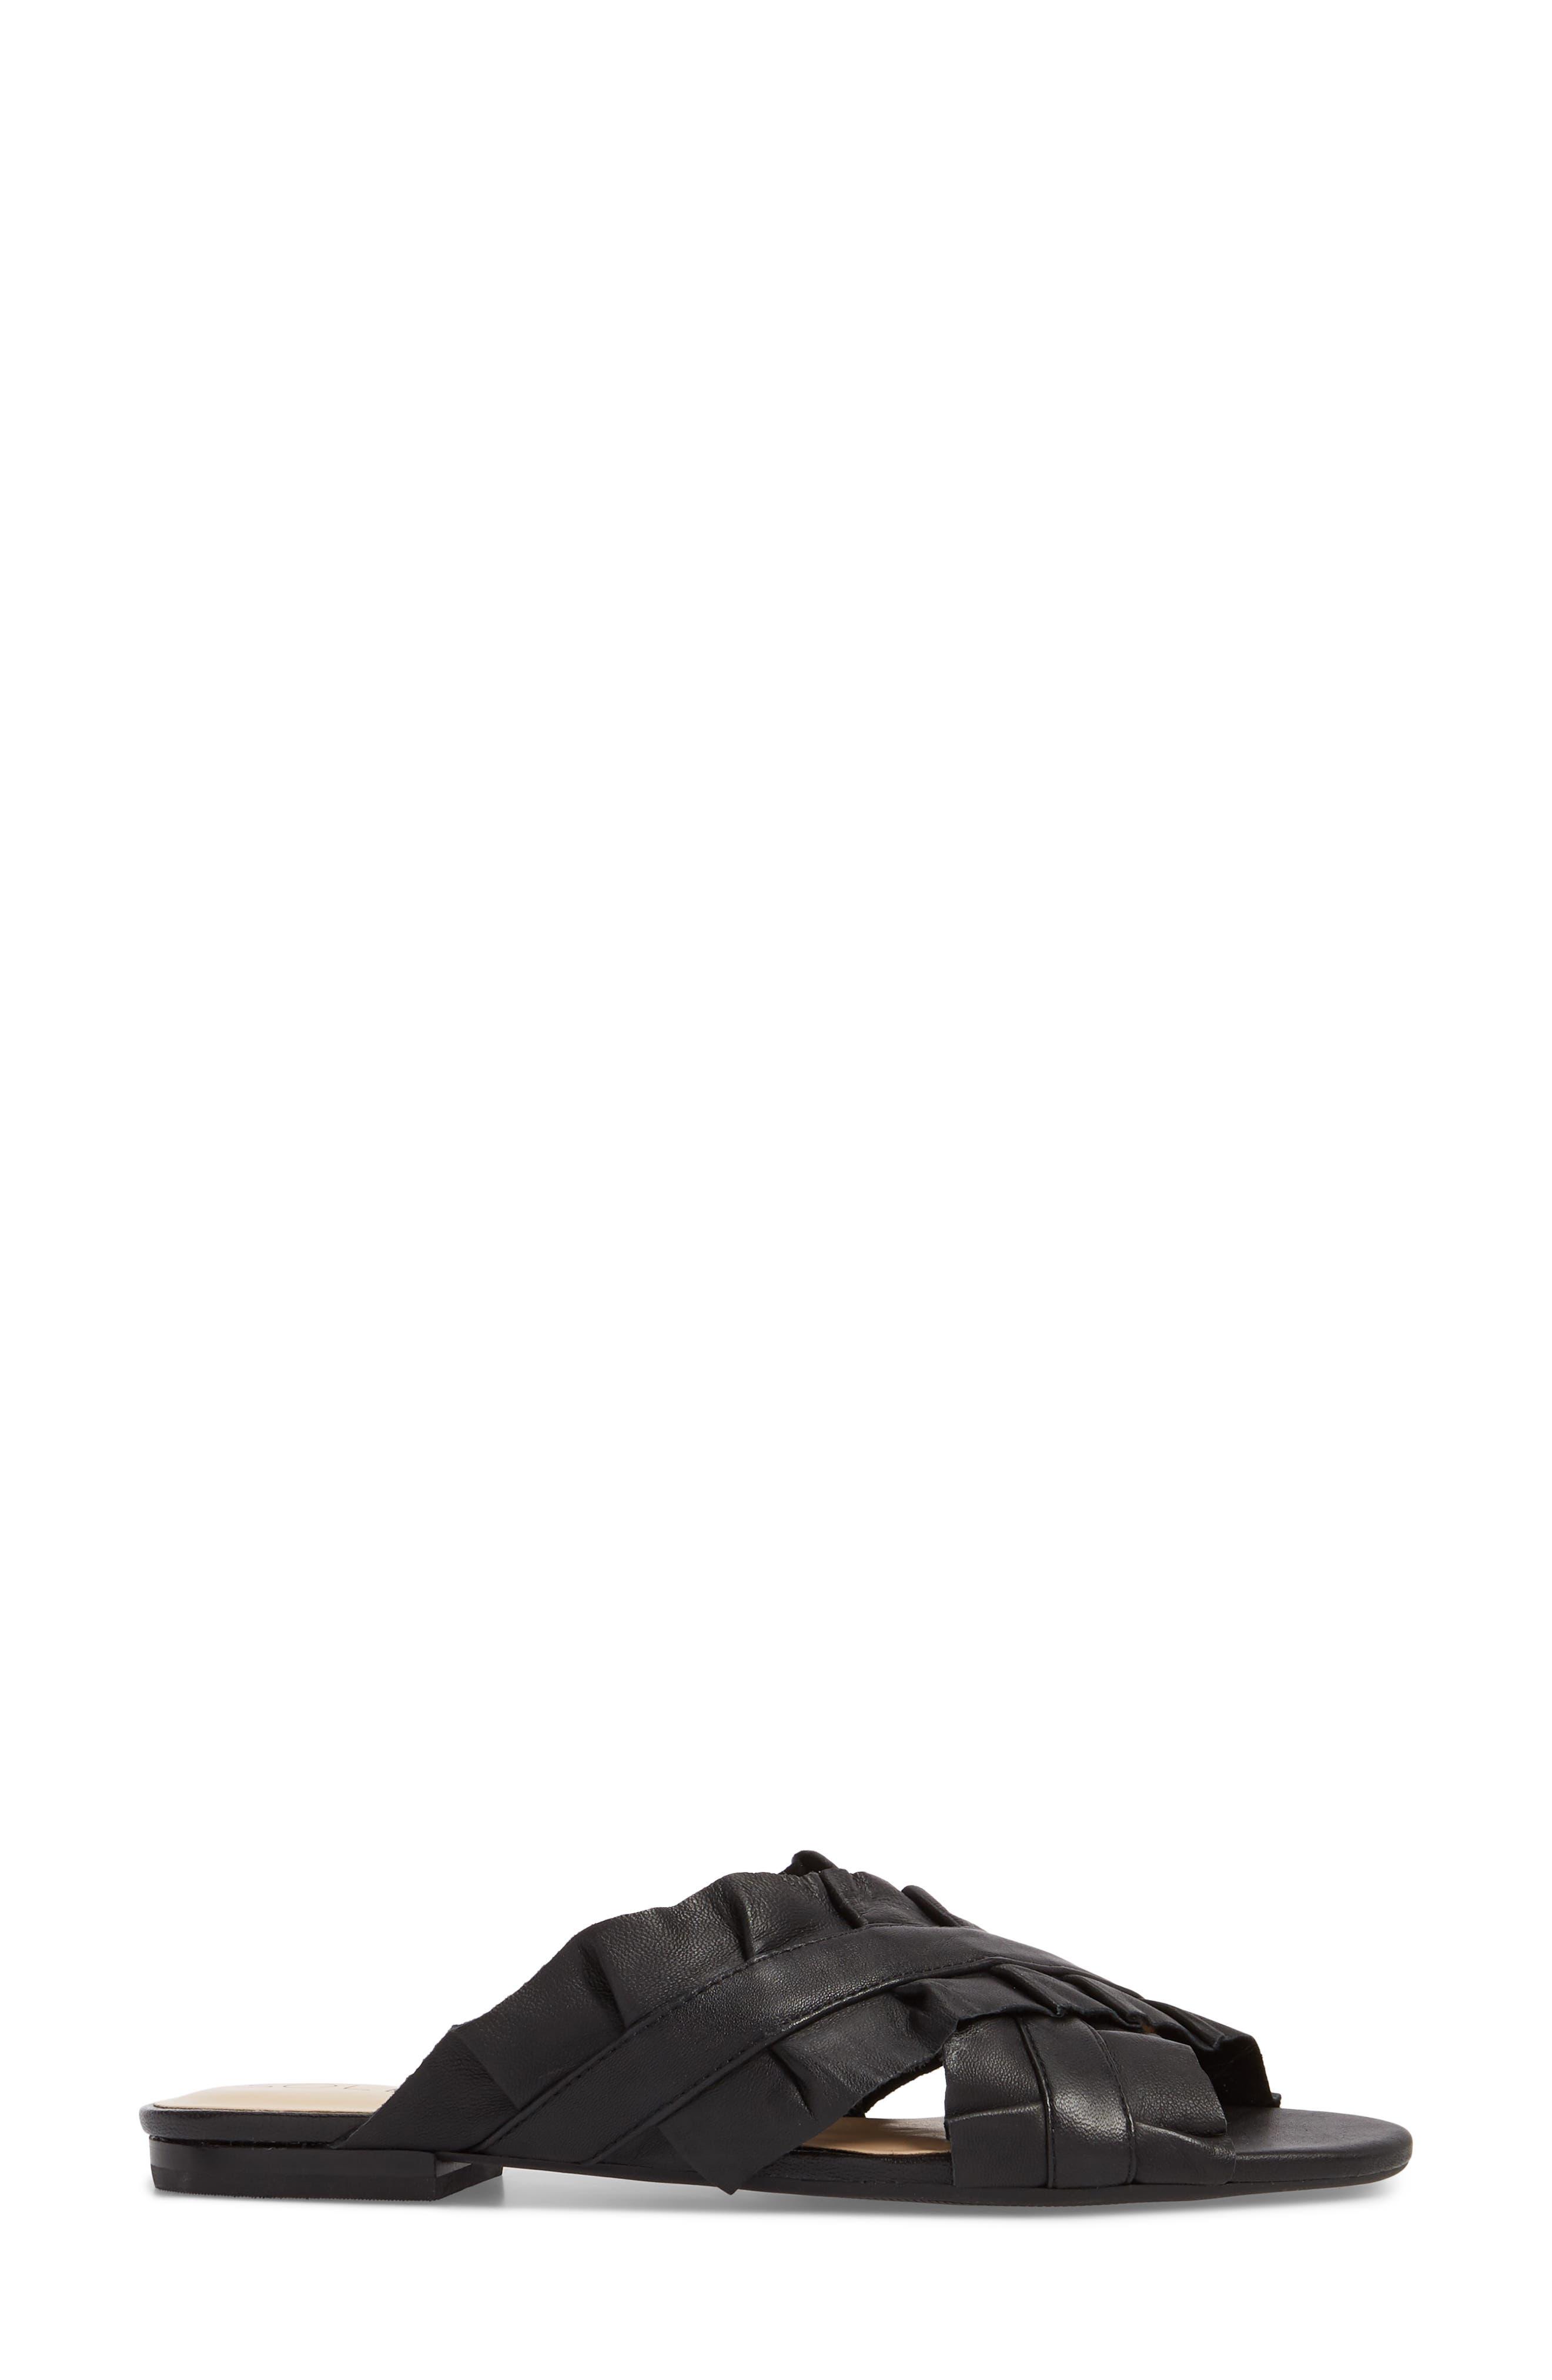 SOLE SOCIETY,                             Mandi Slide Sandal,                             Alternate thumbnail 3, color,                             BLACK